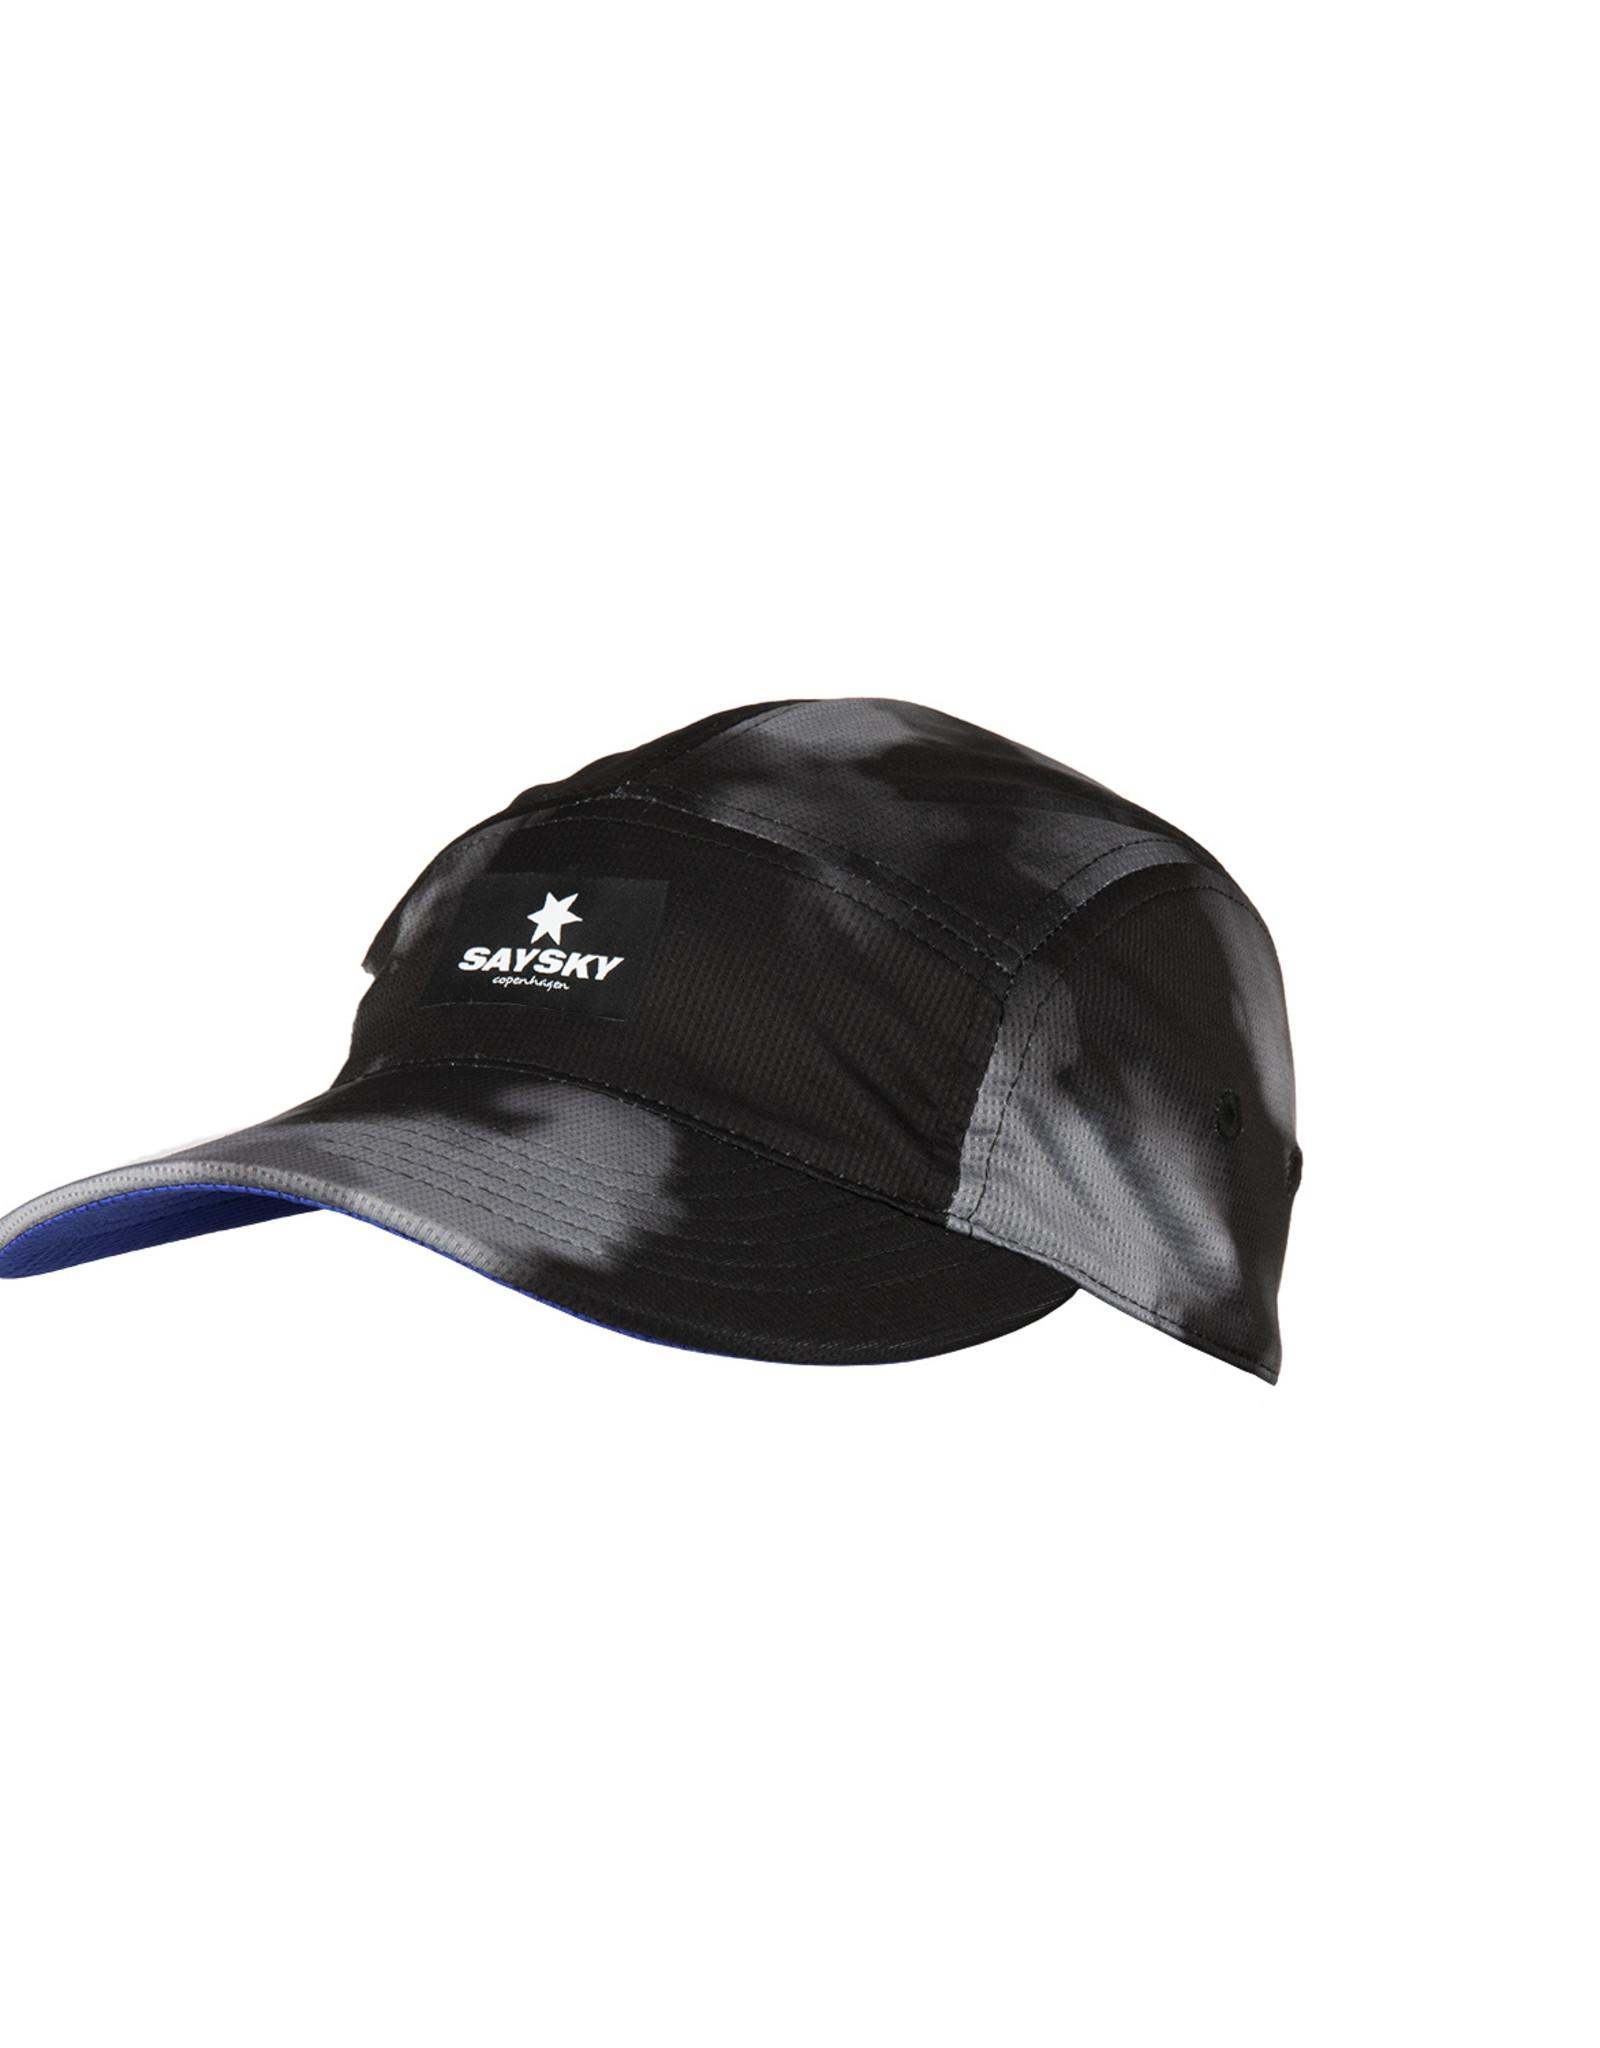 Saysky Cumulus reverse cap